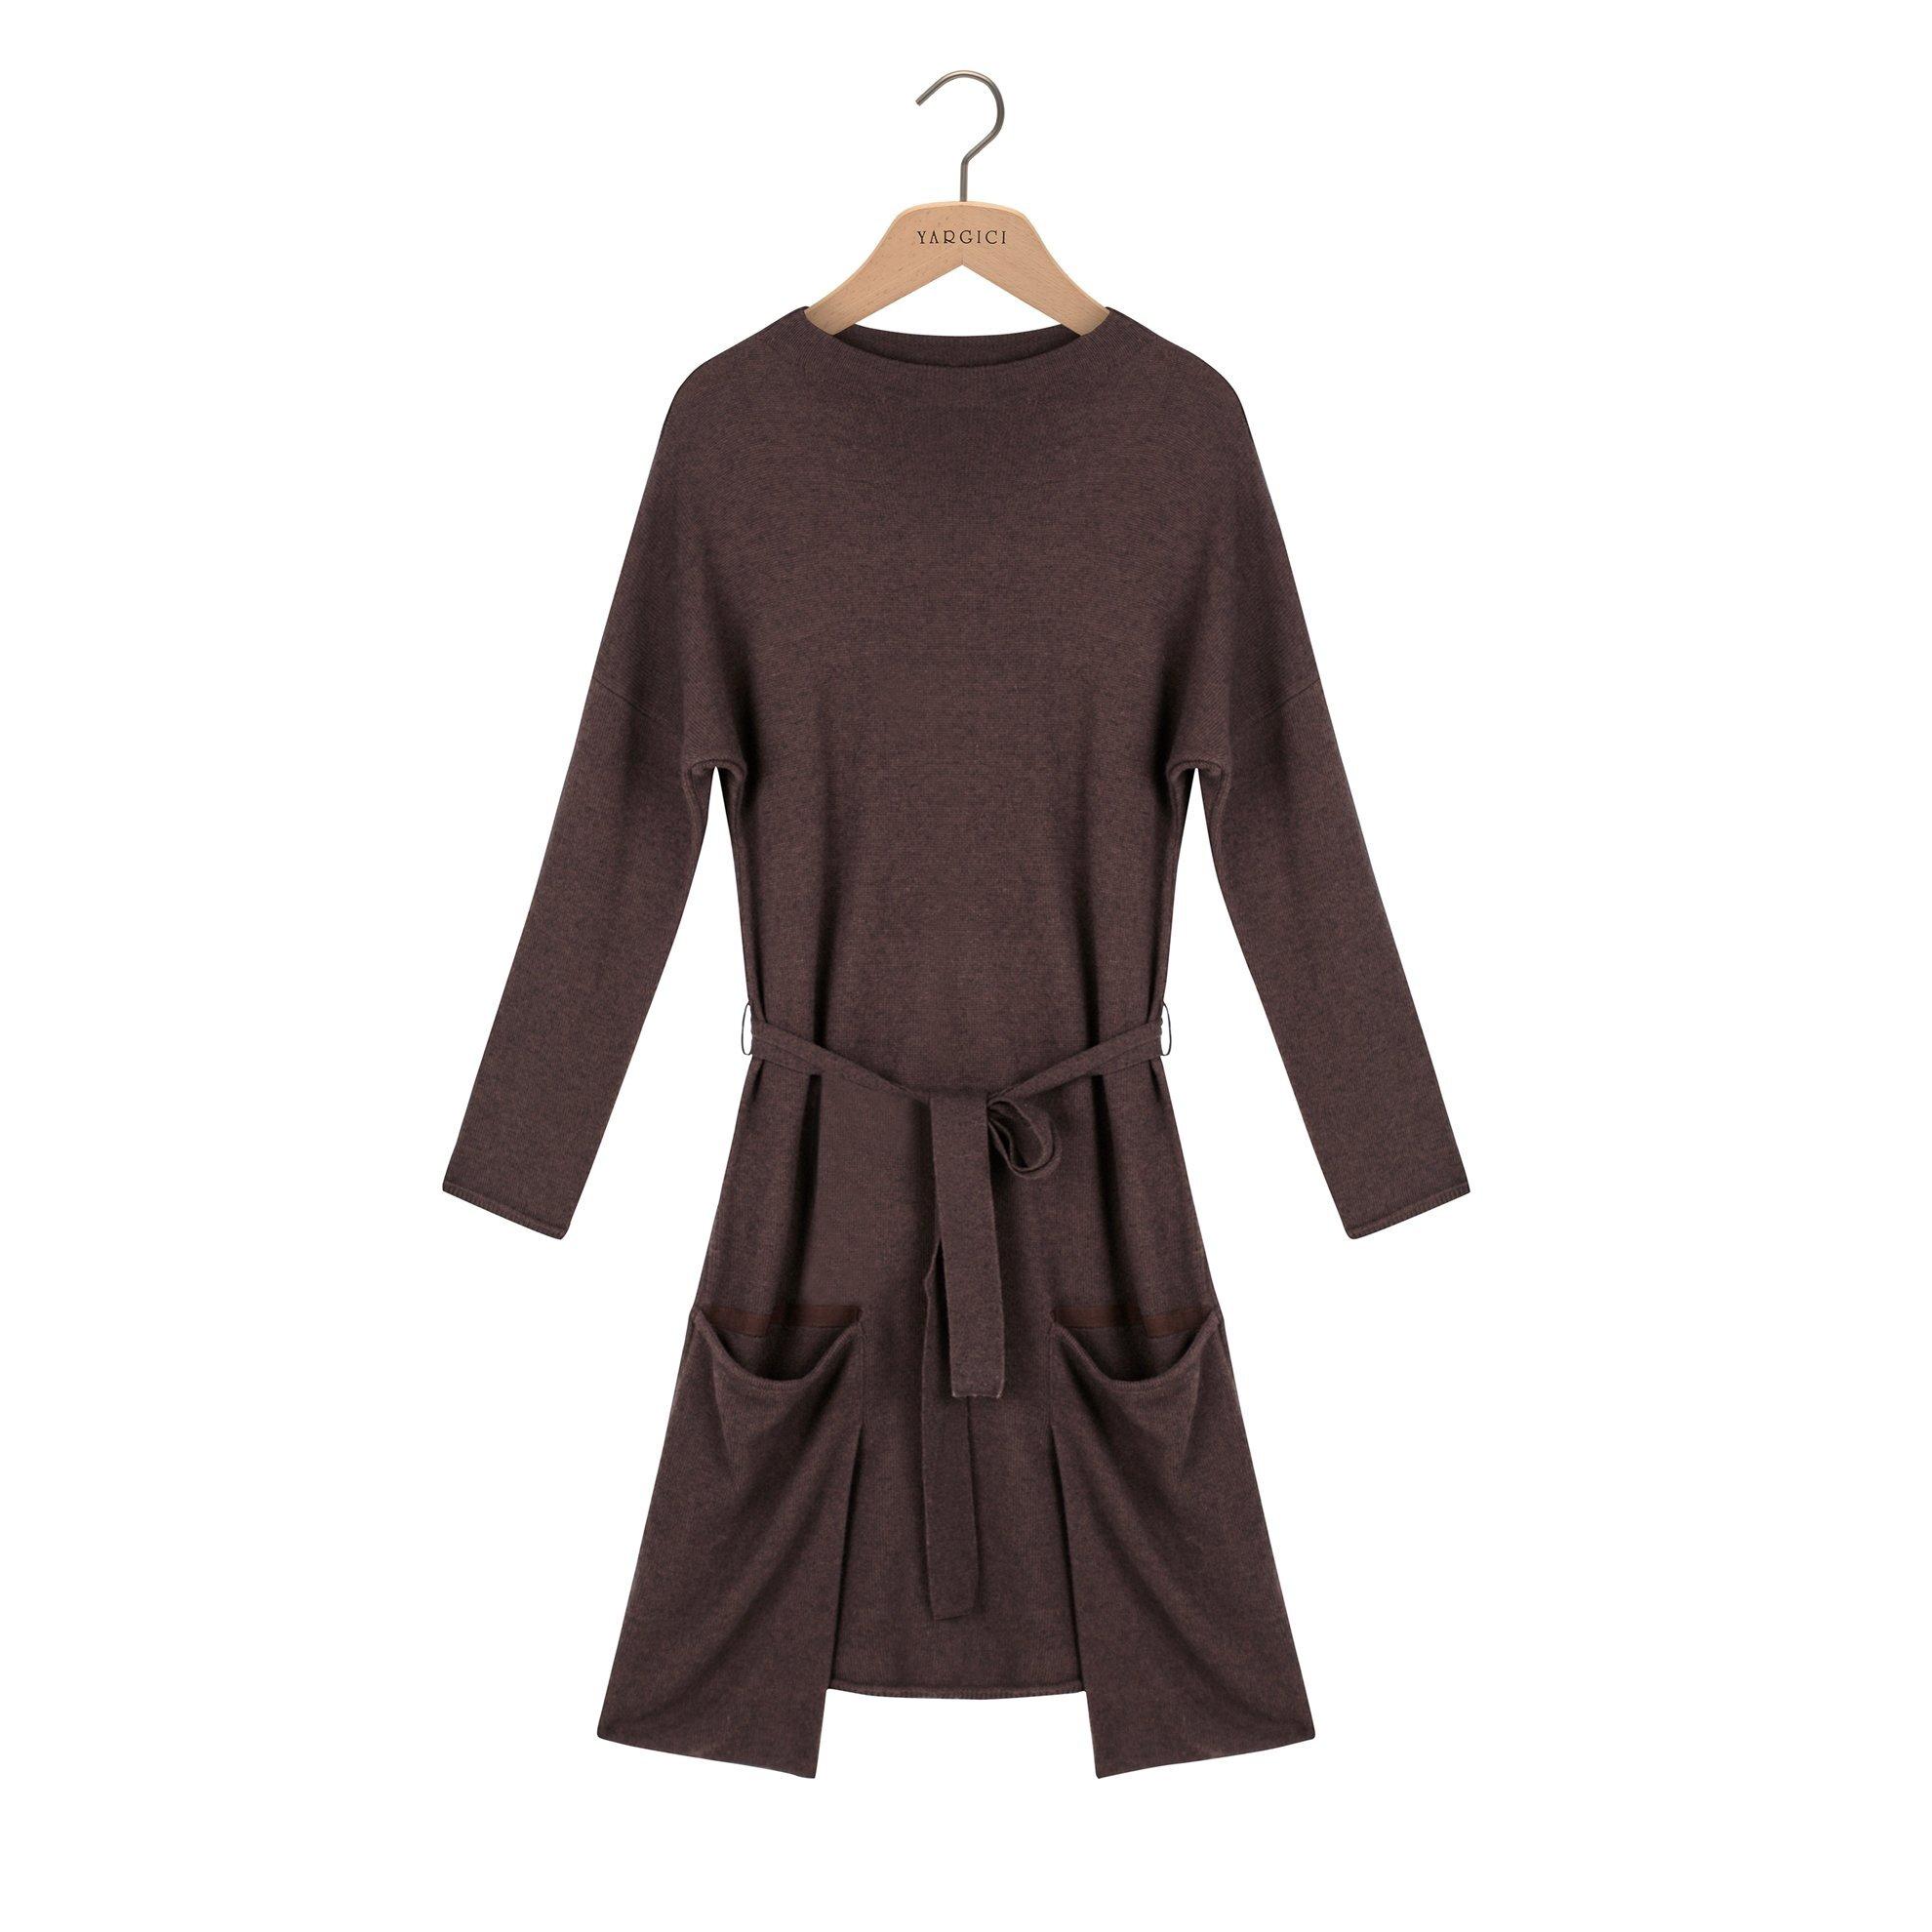 Pocket Detailed Knitted Dress